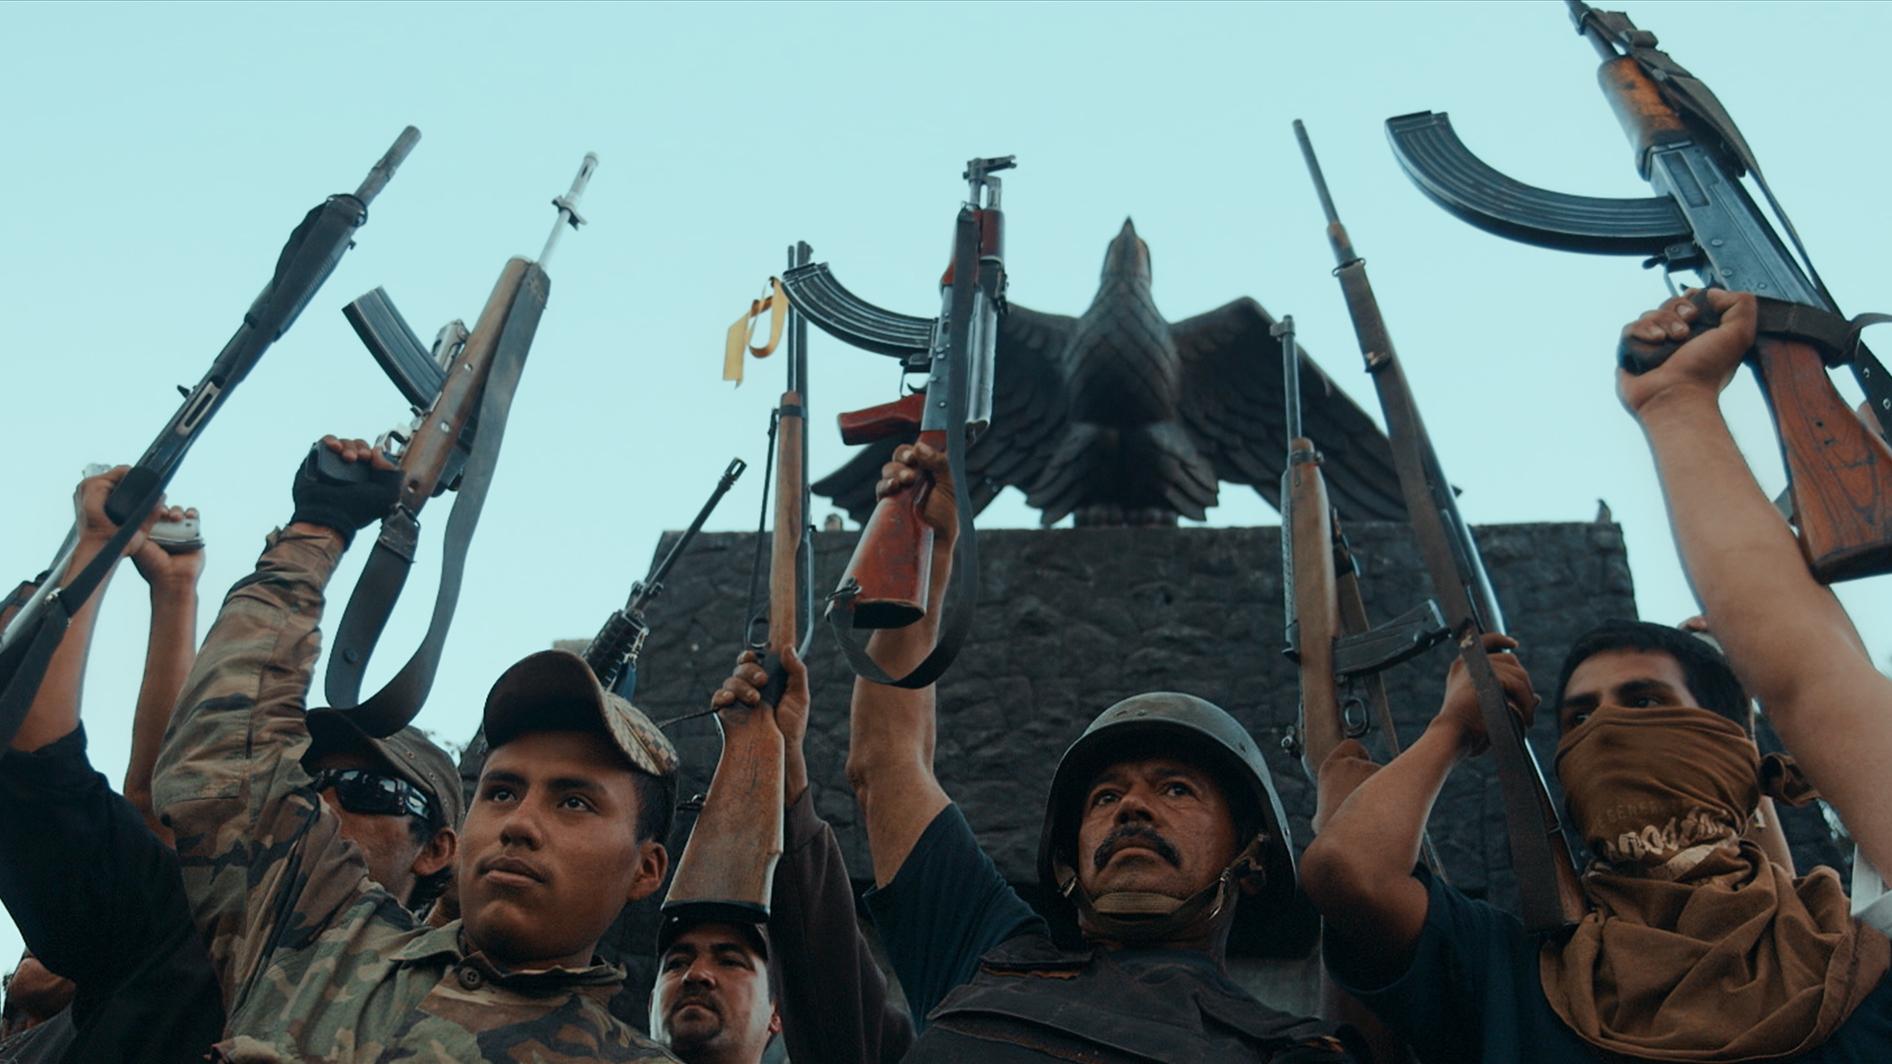 #6 - Autodefensa members in Michoacán, Mexico, from CARTEL LAND, a film by Matthew Heineman.jpg